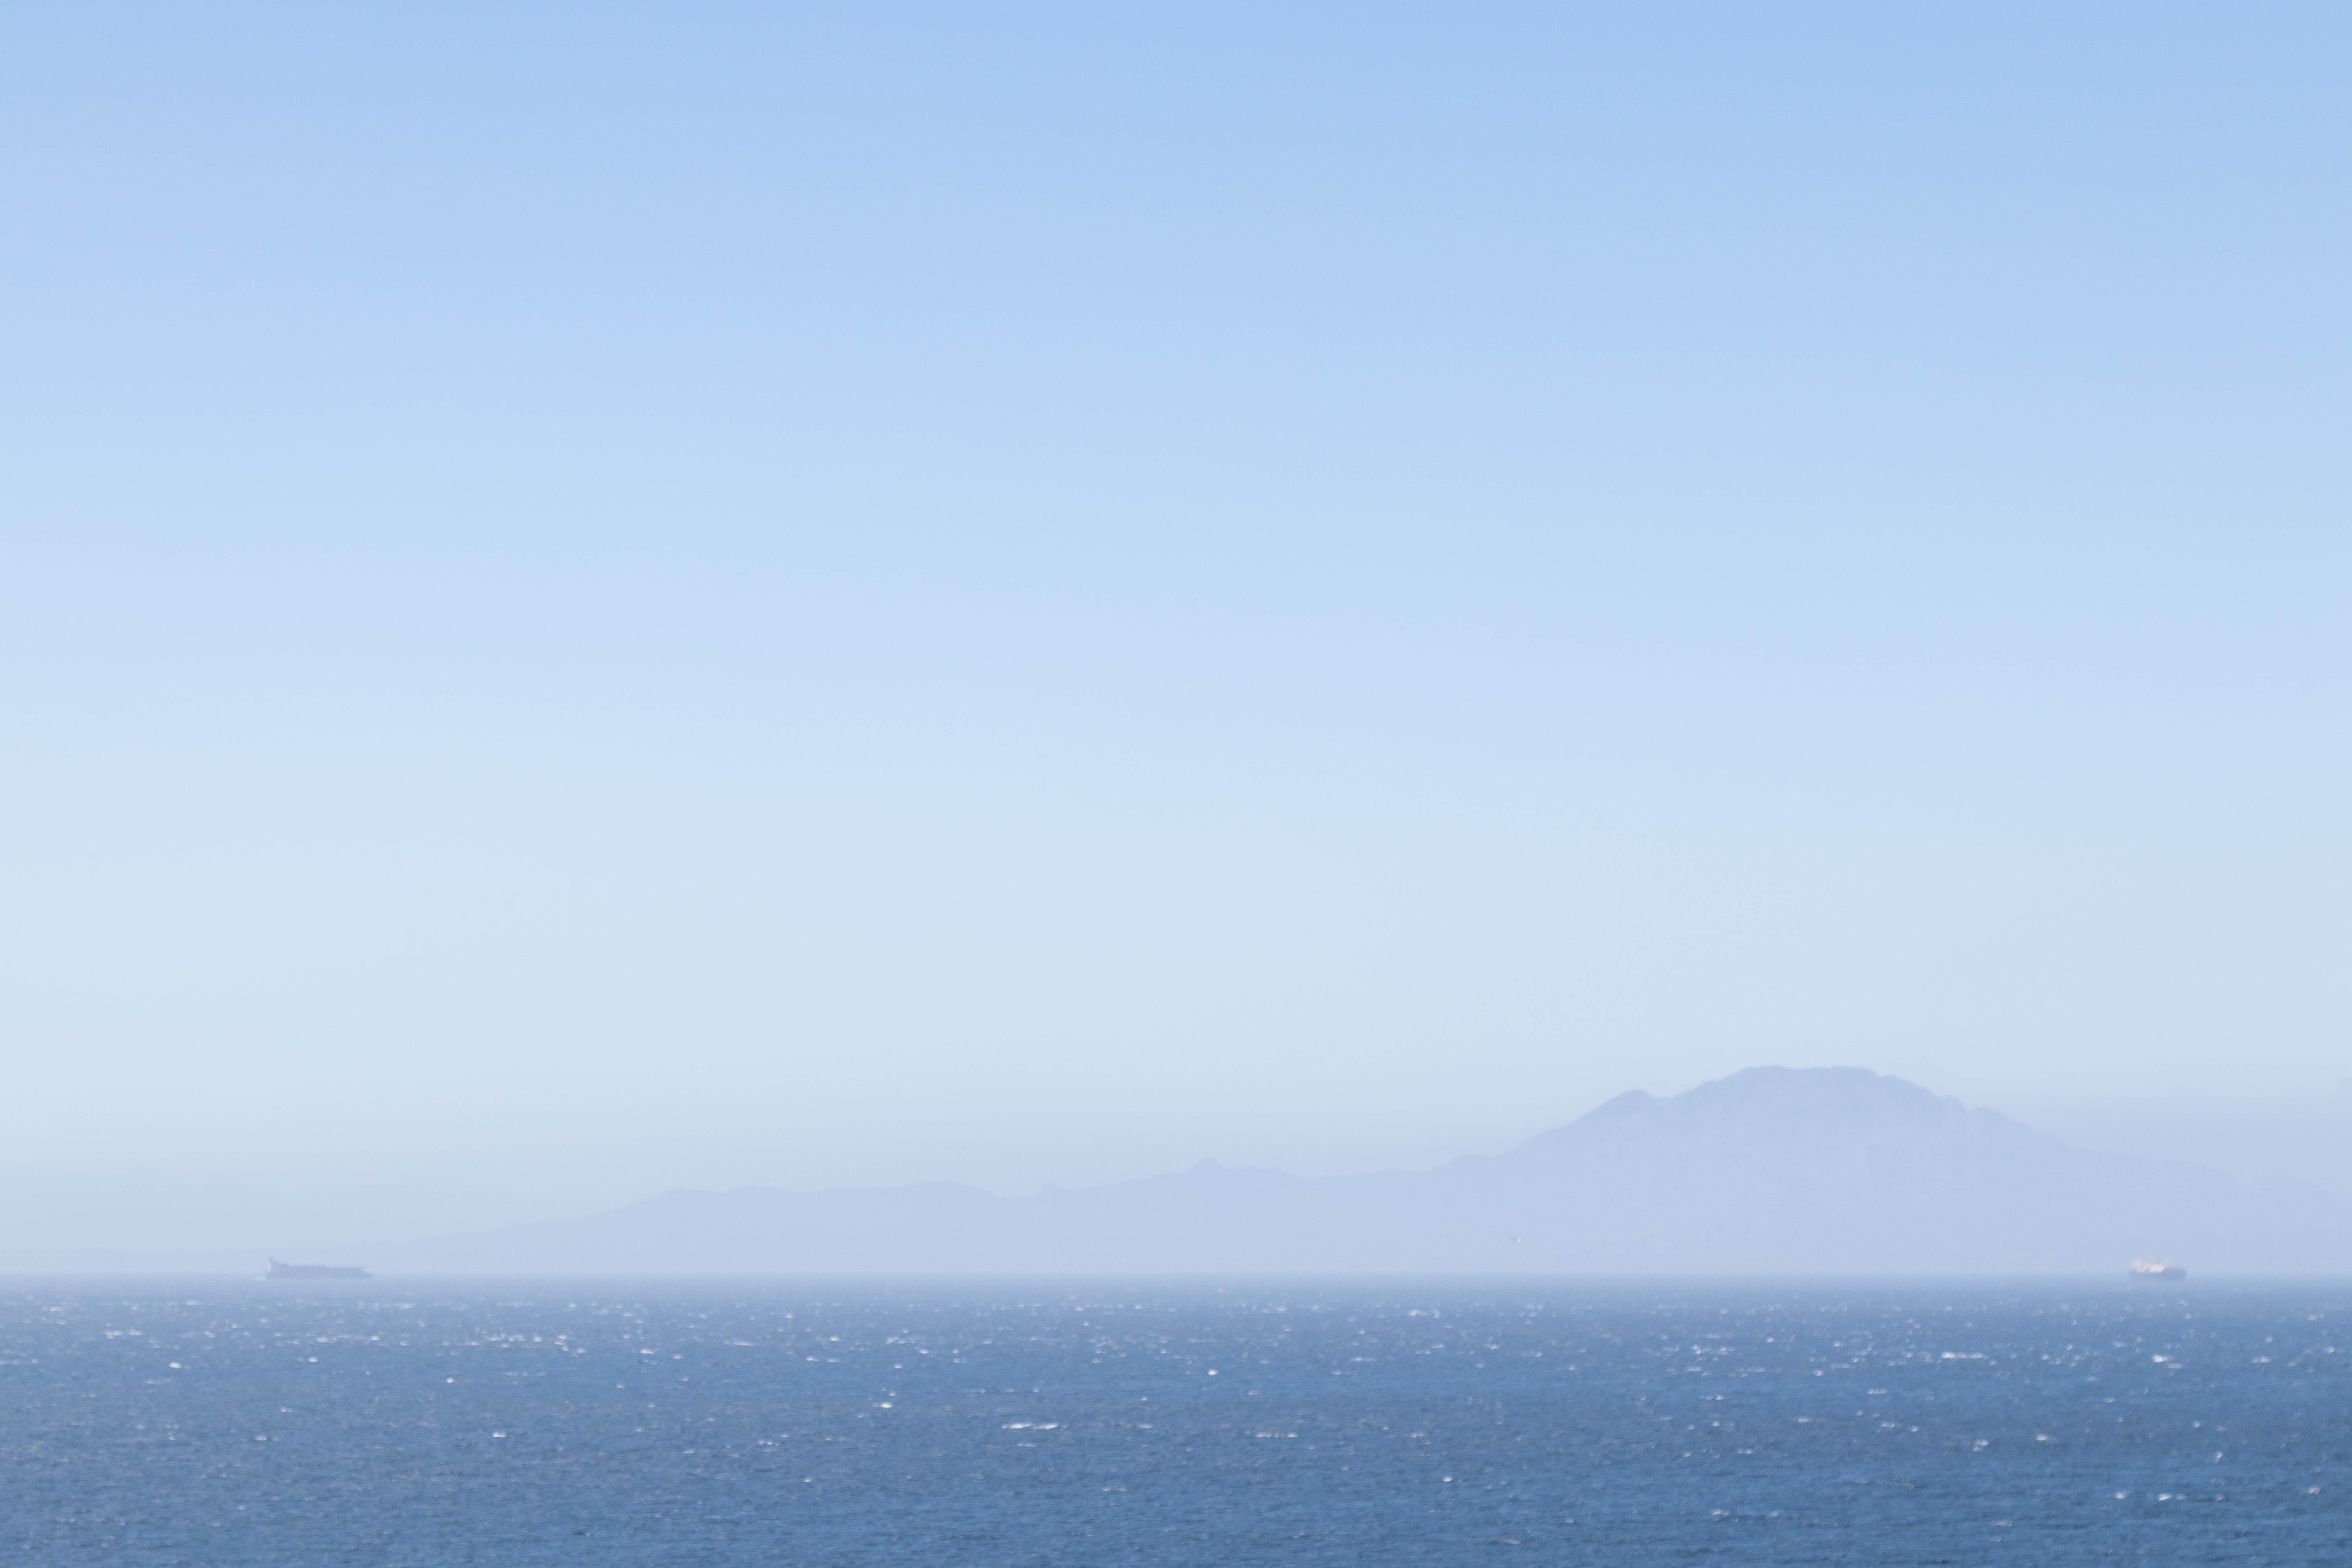 Mediterranean Cruise: Gibraltar, UK | https://www.roseclearfield.com